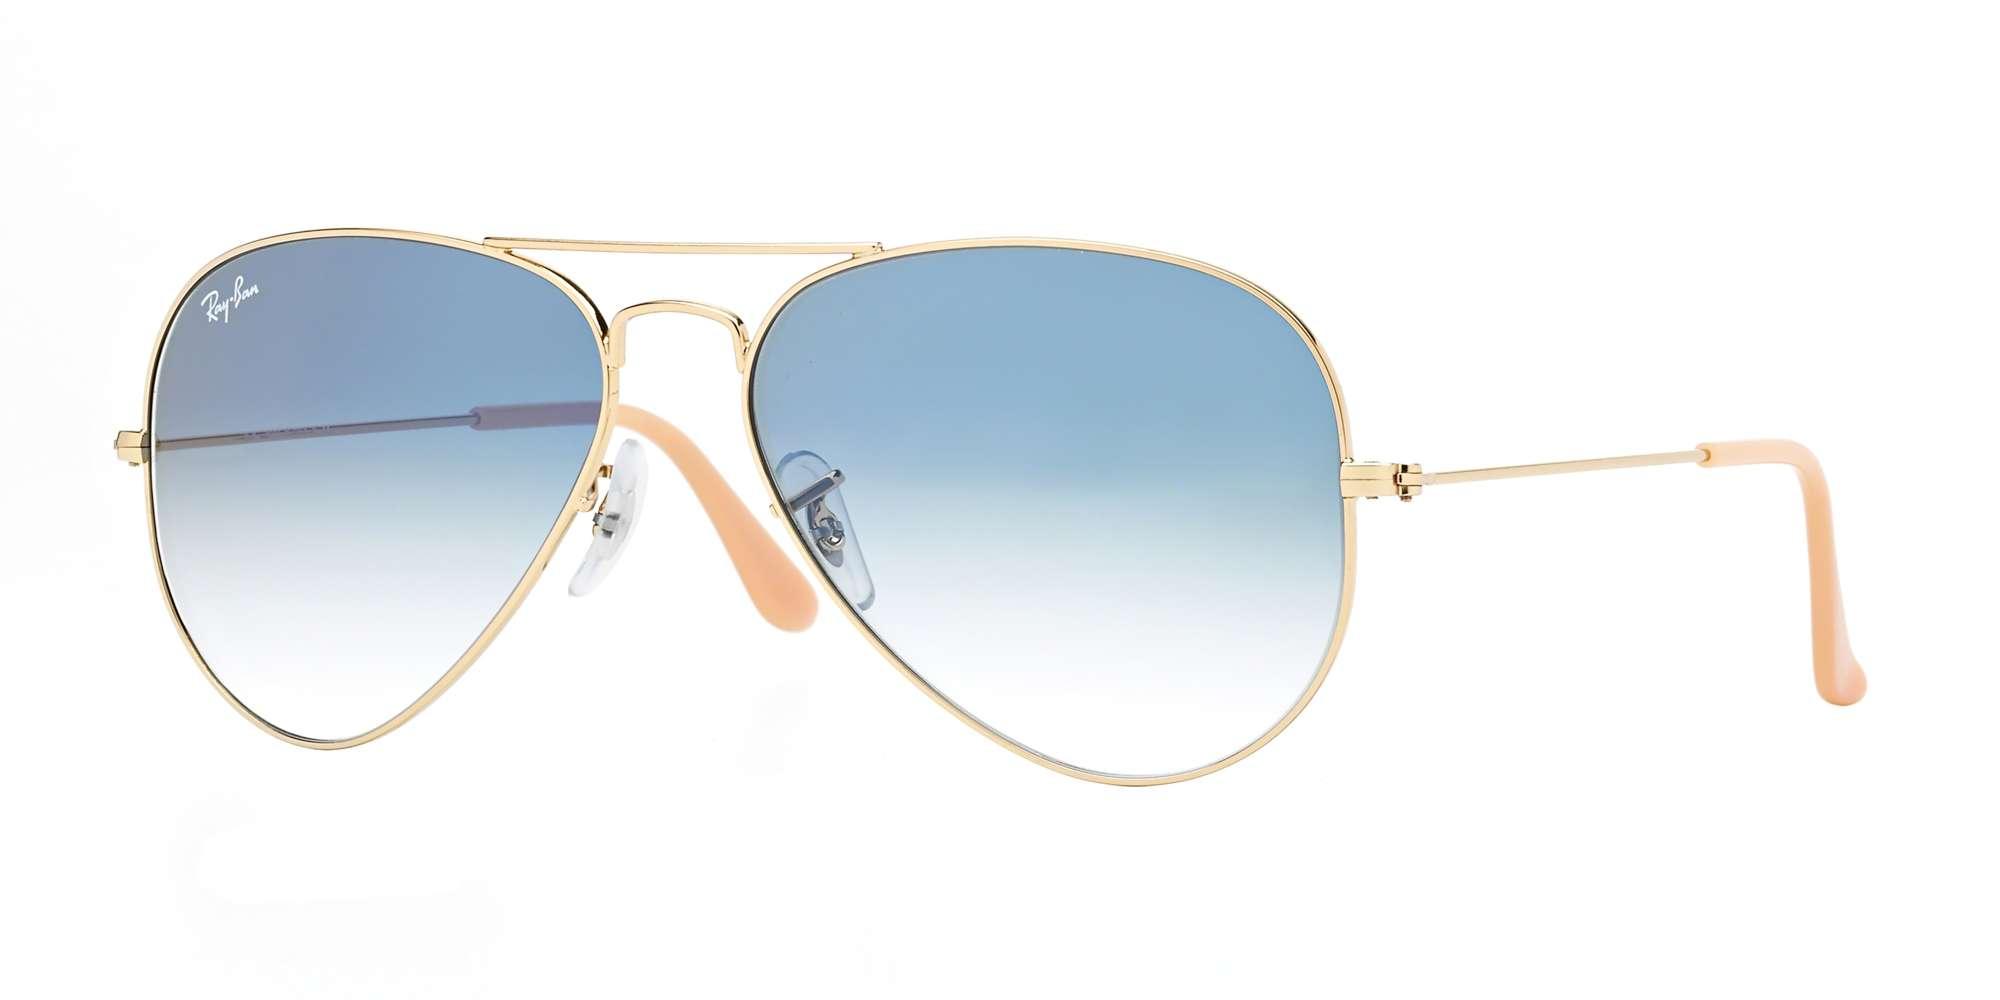 e36bf0f02f1 Ray-Ban RB3025 - Large Aviator Metal Sunglasses